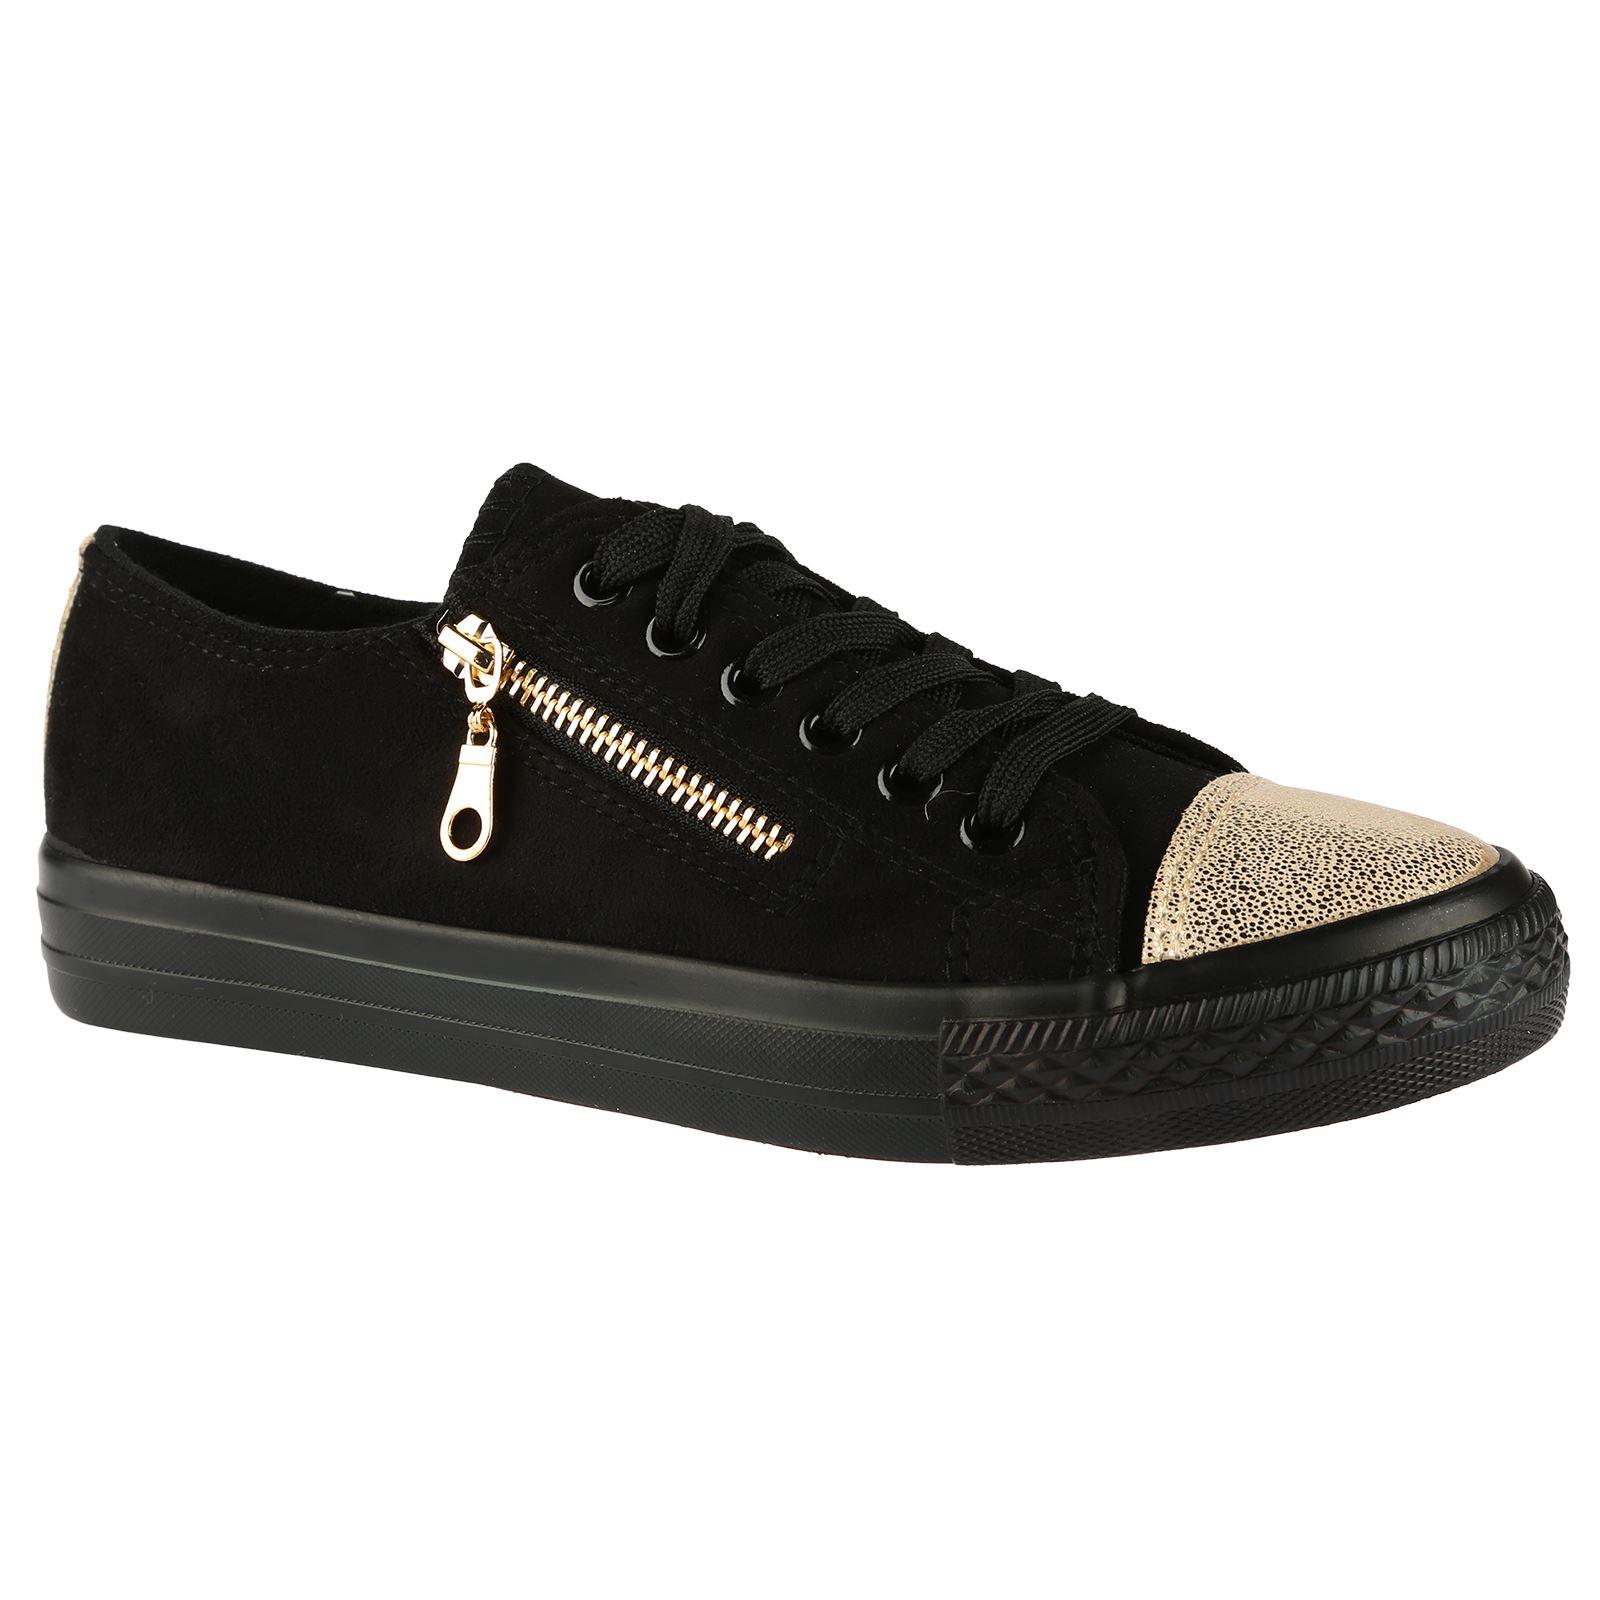 Floral Diamonte Lace Up Shoes